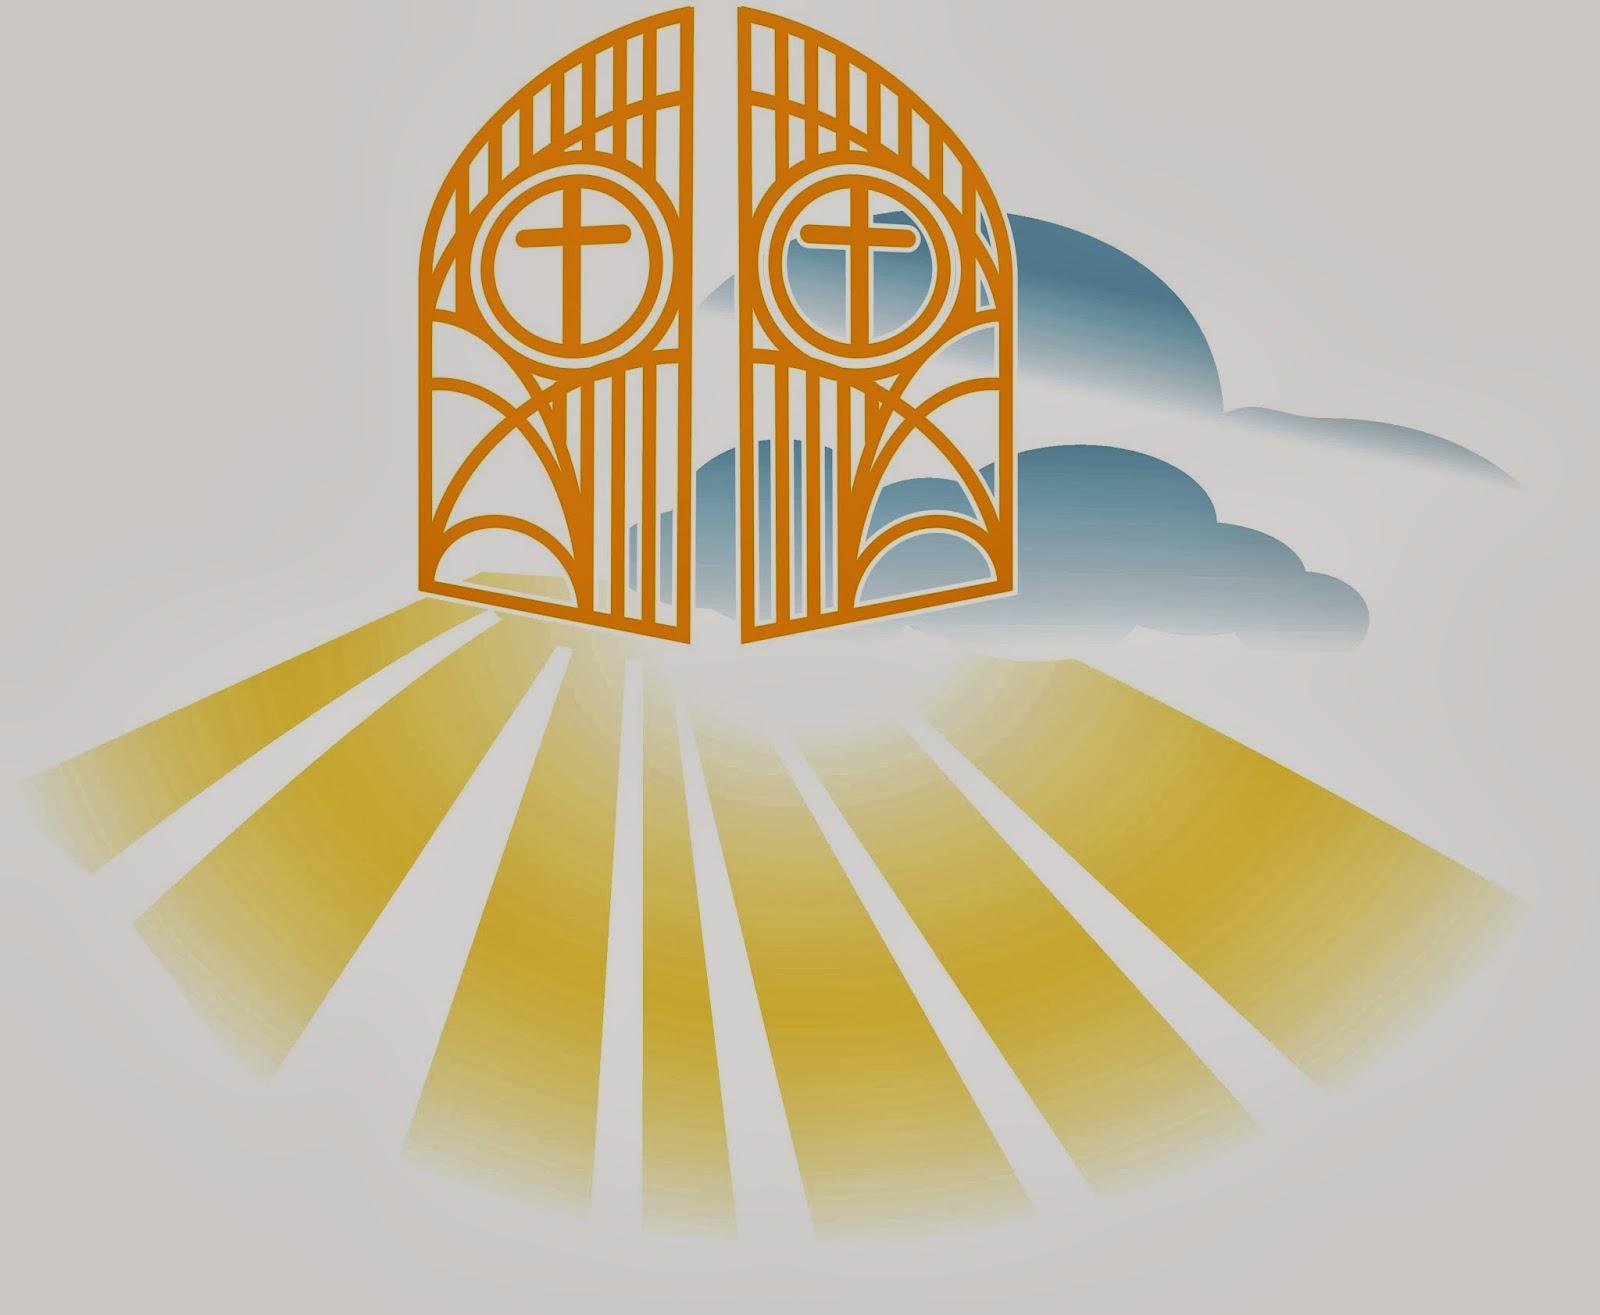 Heaven clipart heaven's gate. Free heavens gates cliparts